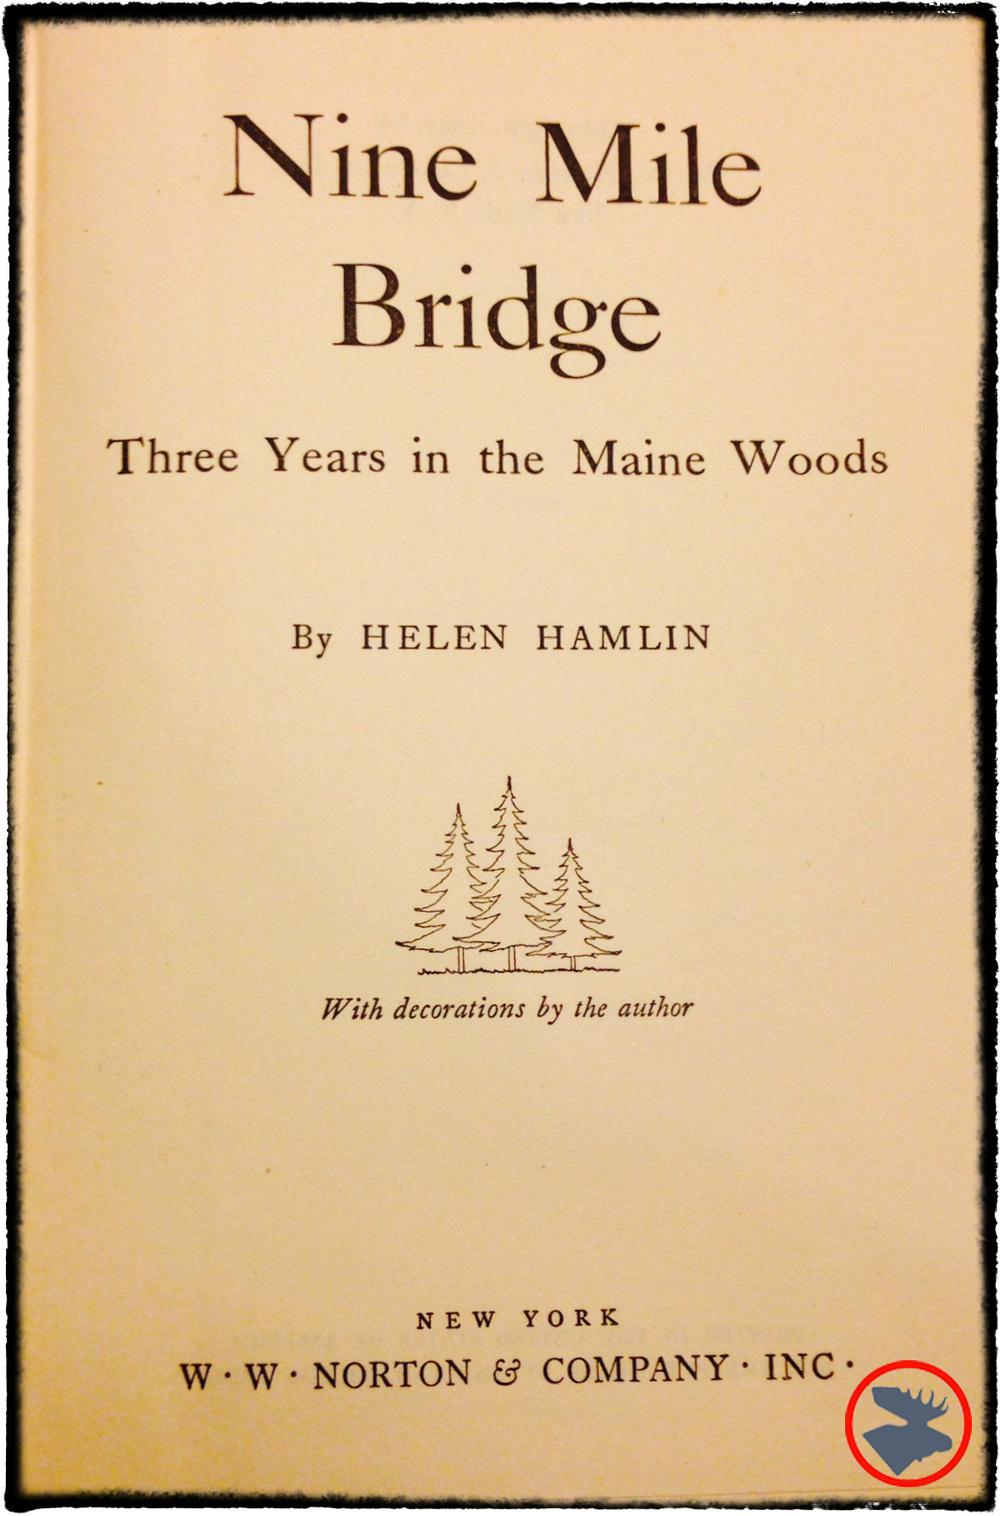 My copy of Nine Mile Bridge.